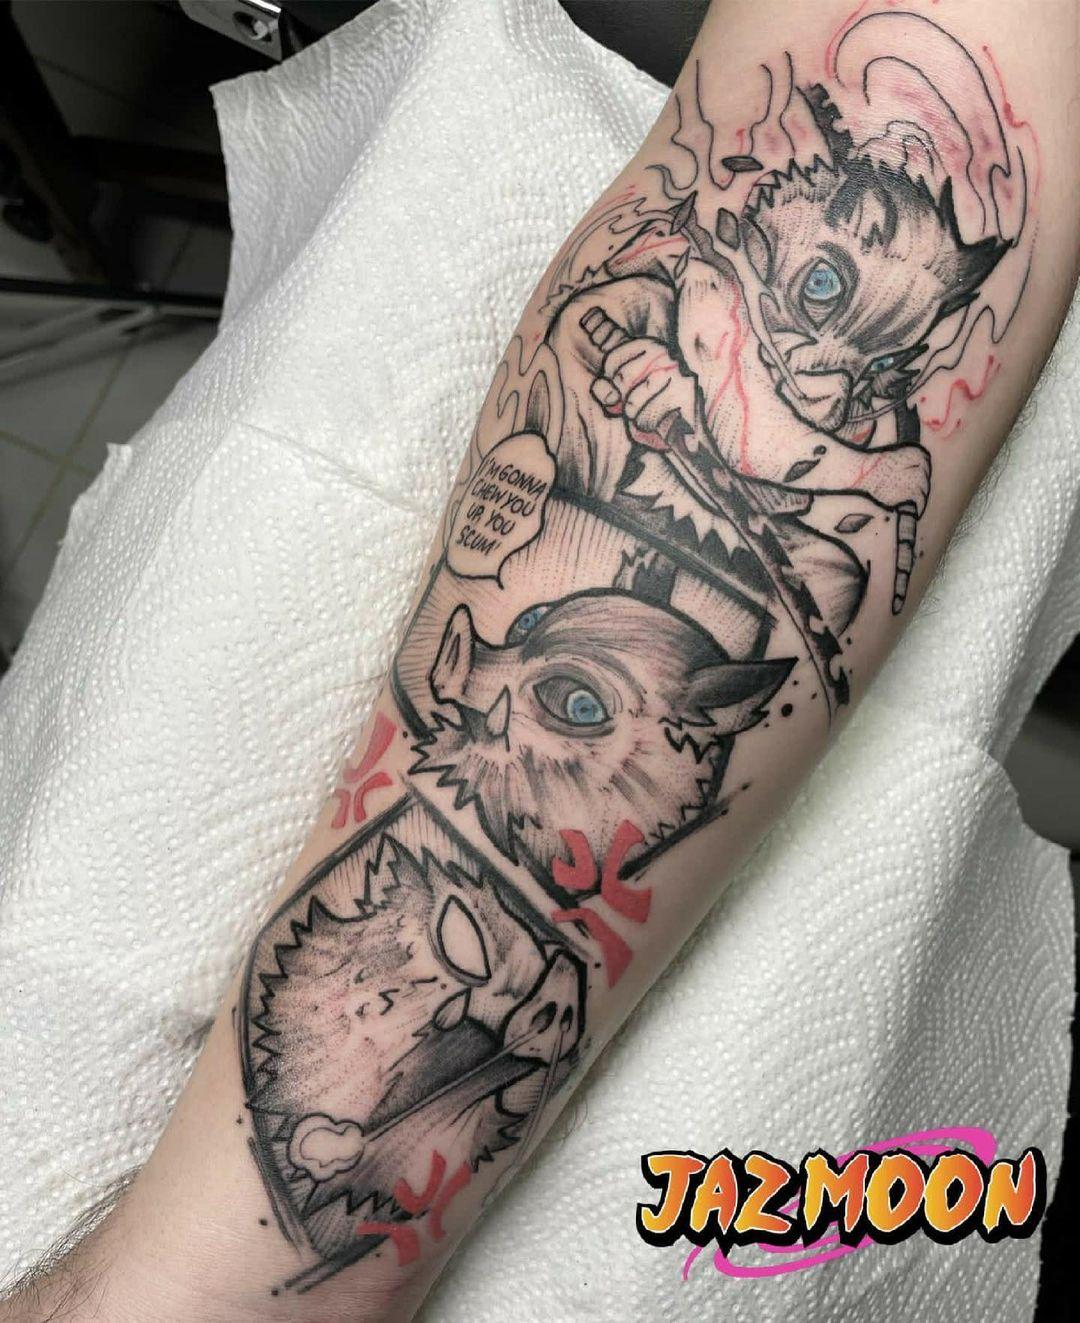 Limited Color Inosuke Manga-Style Panel Tattoo